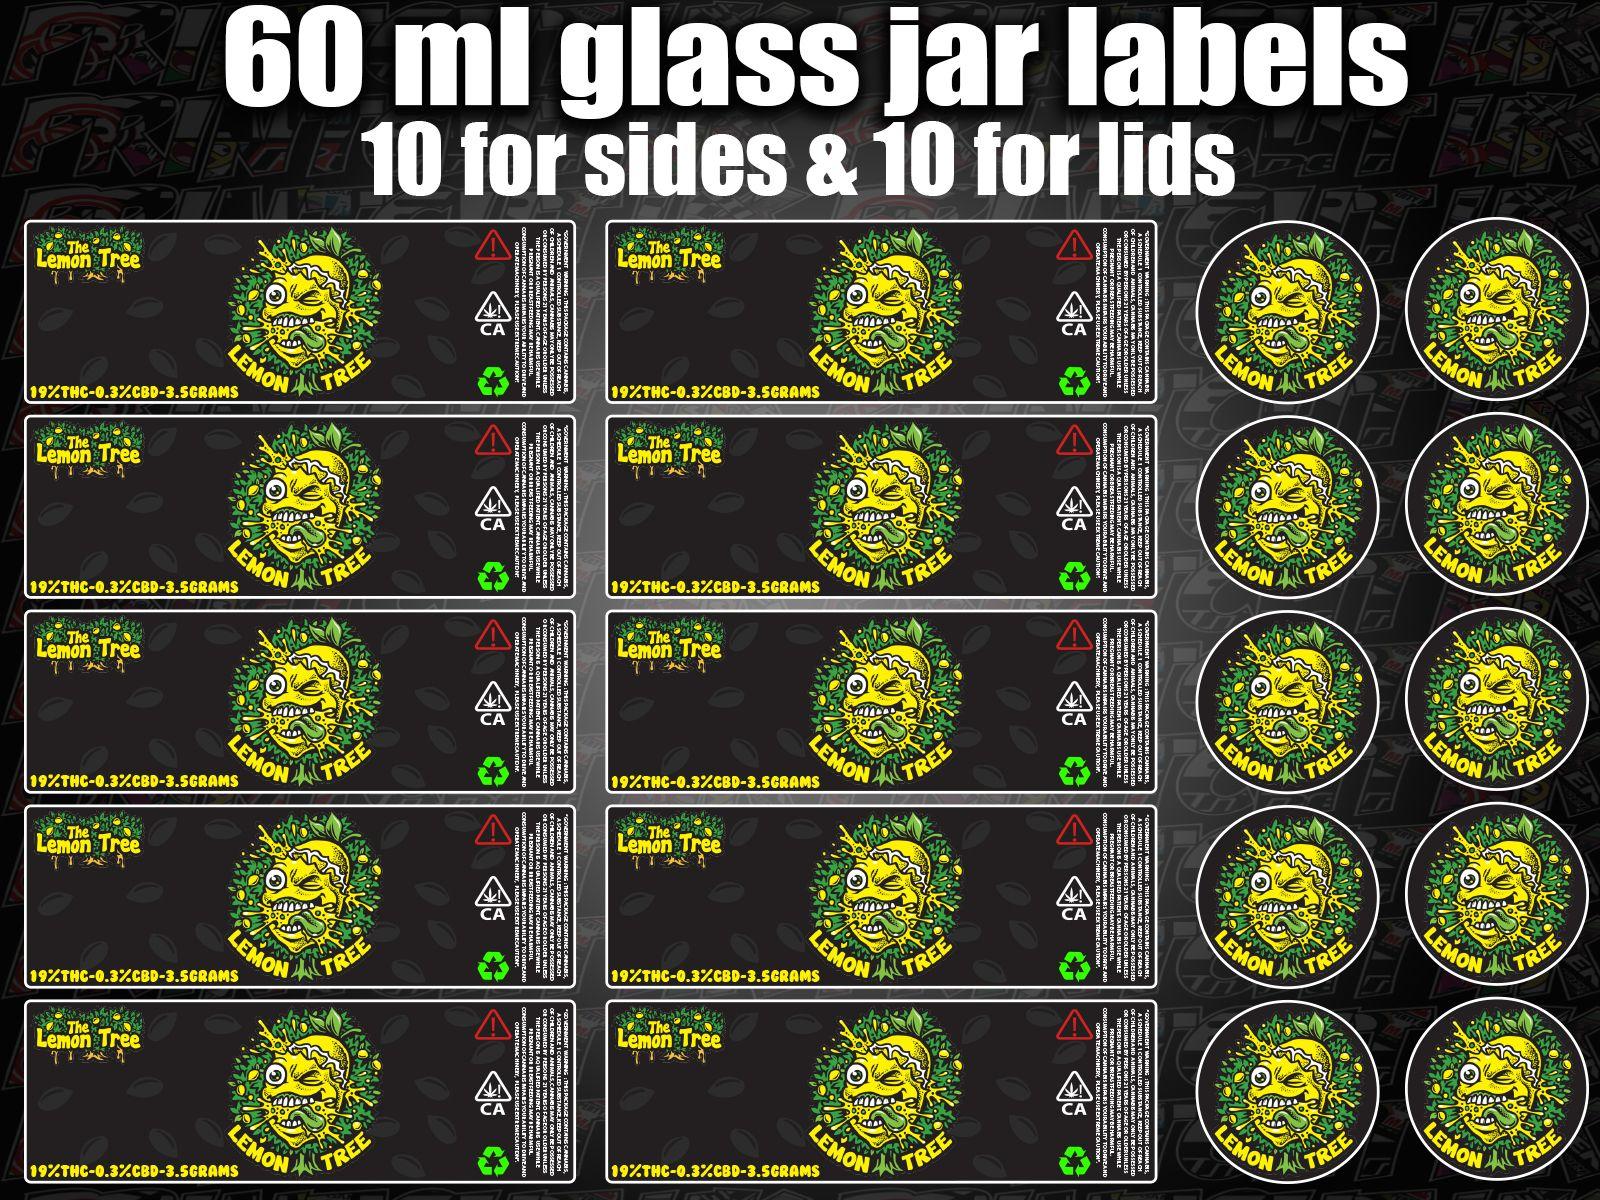 LEMON TREE 60ml glass cali jar labels RX pressitin HIGH QUALITY